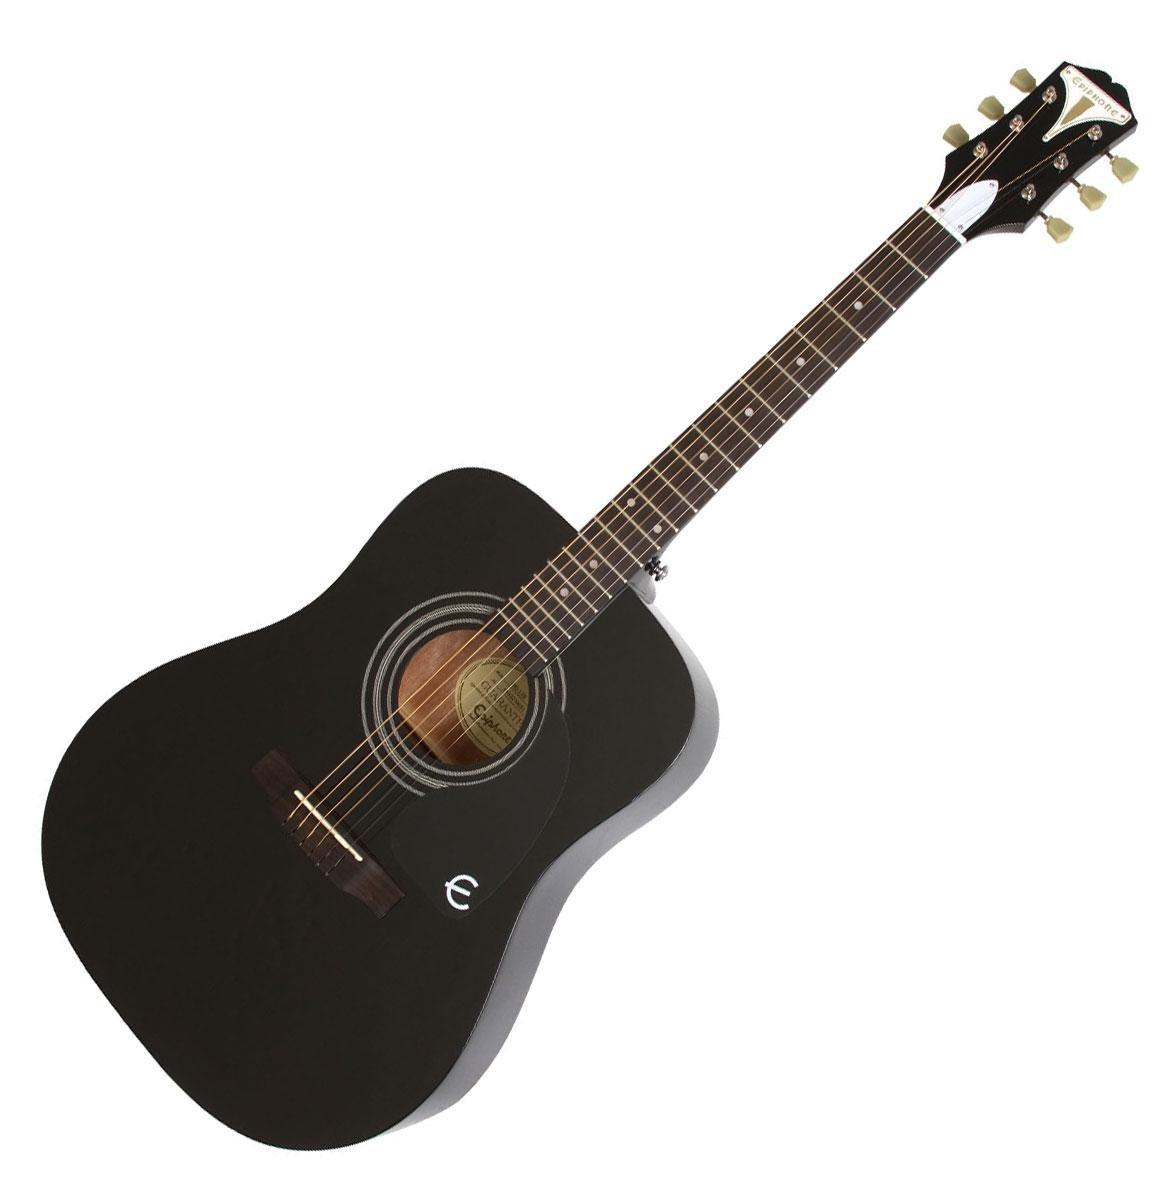 Epiphone 6 String PRO-1 Acoustic, Ebony (EAPREBCH1)